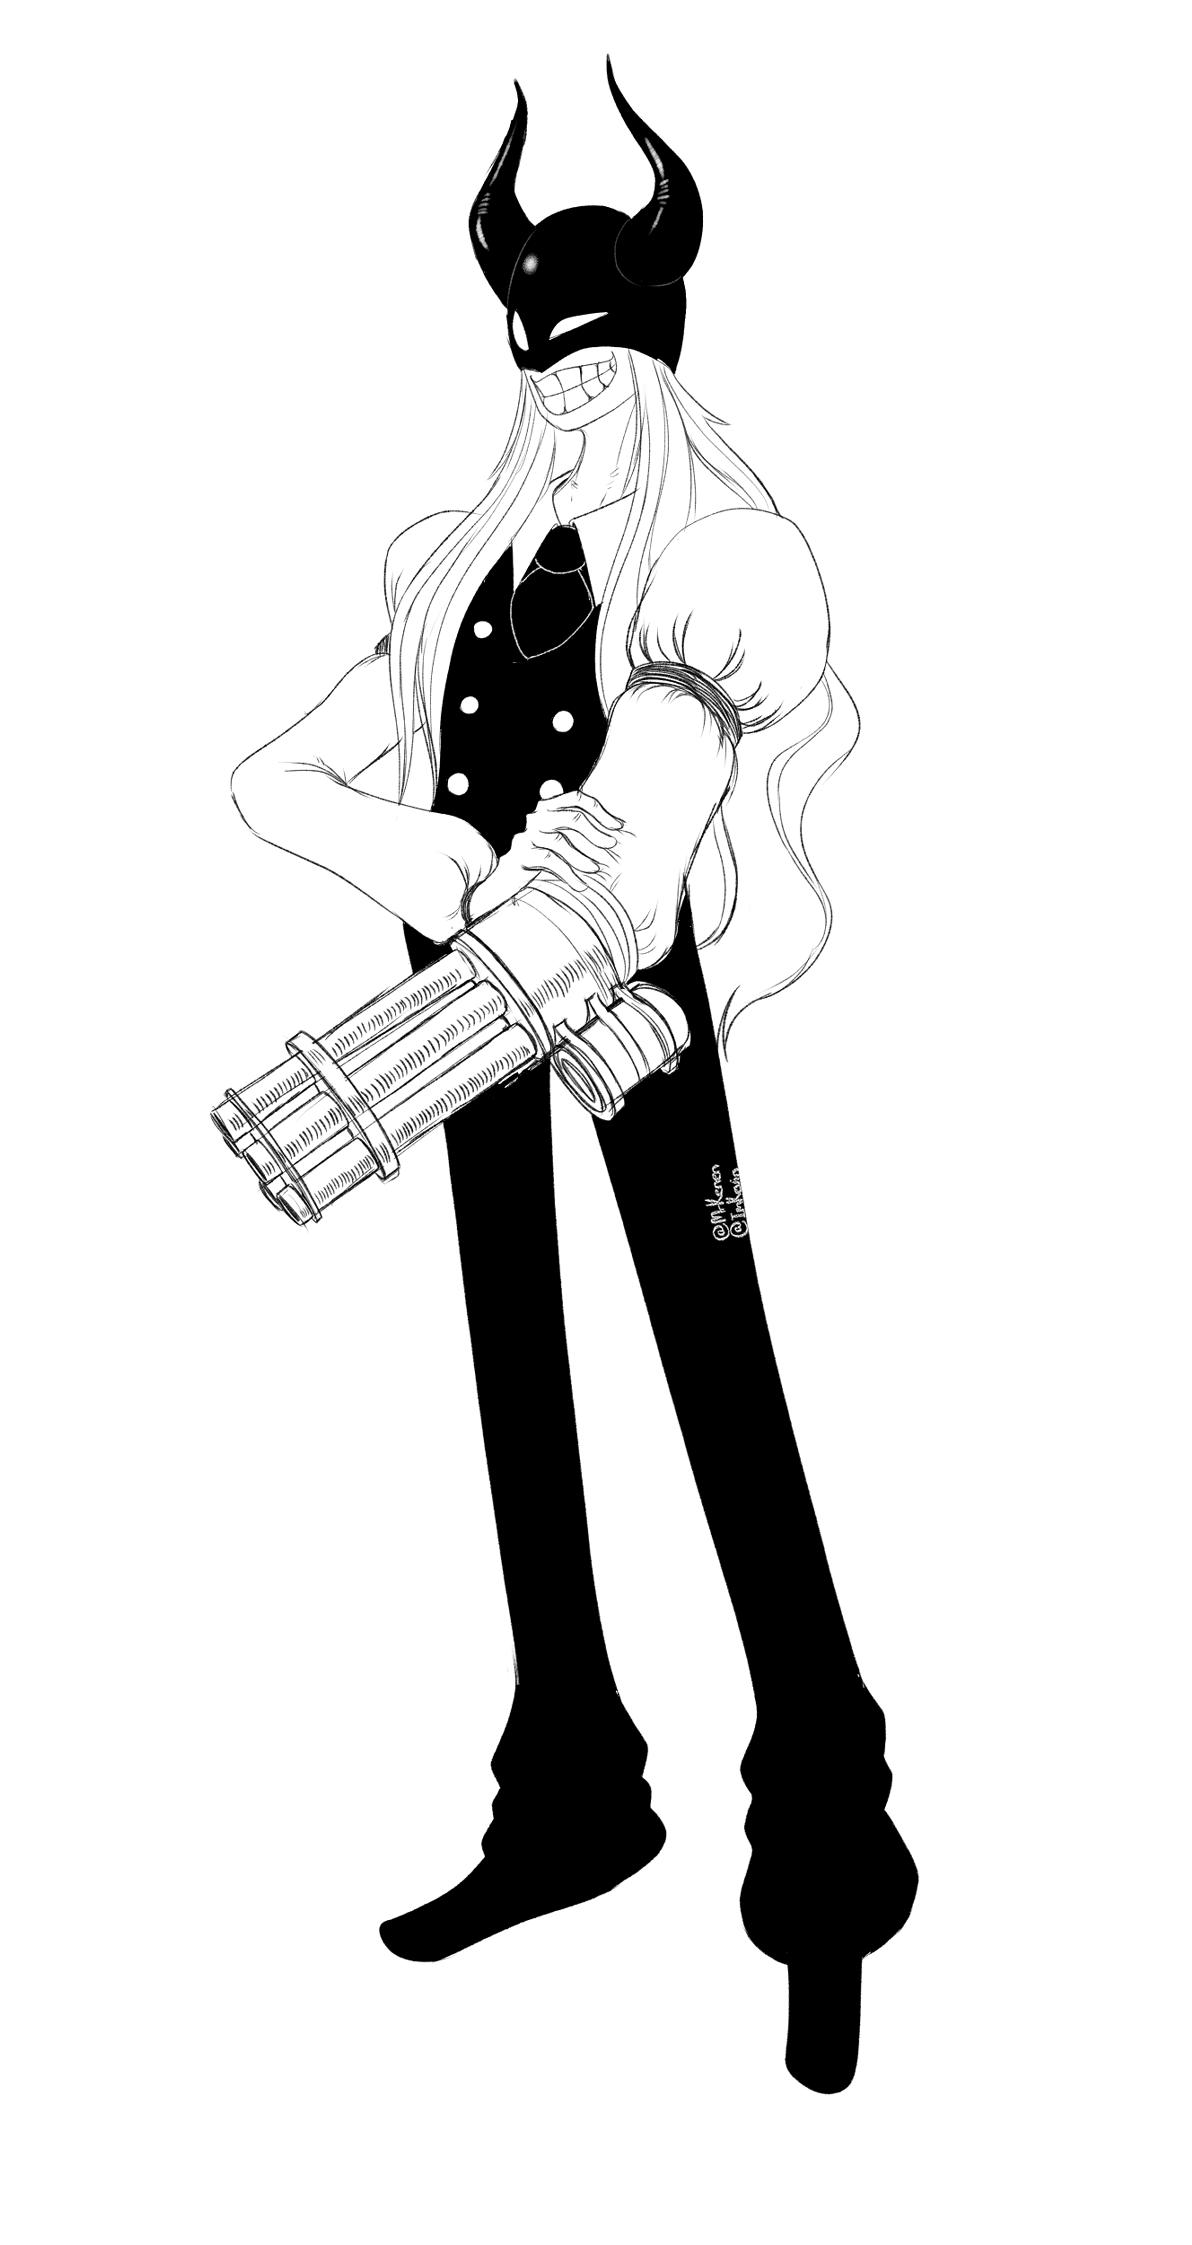 Antagonist dude??